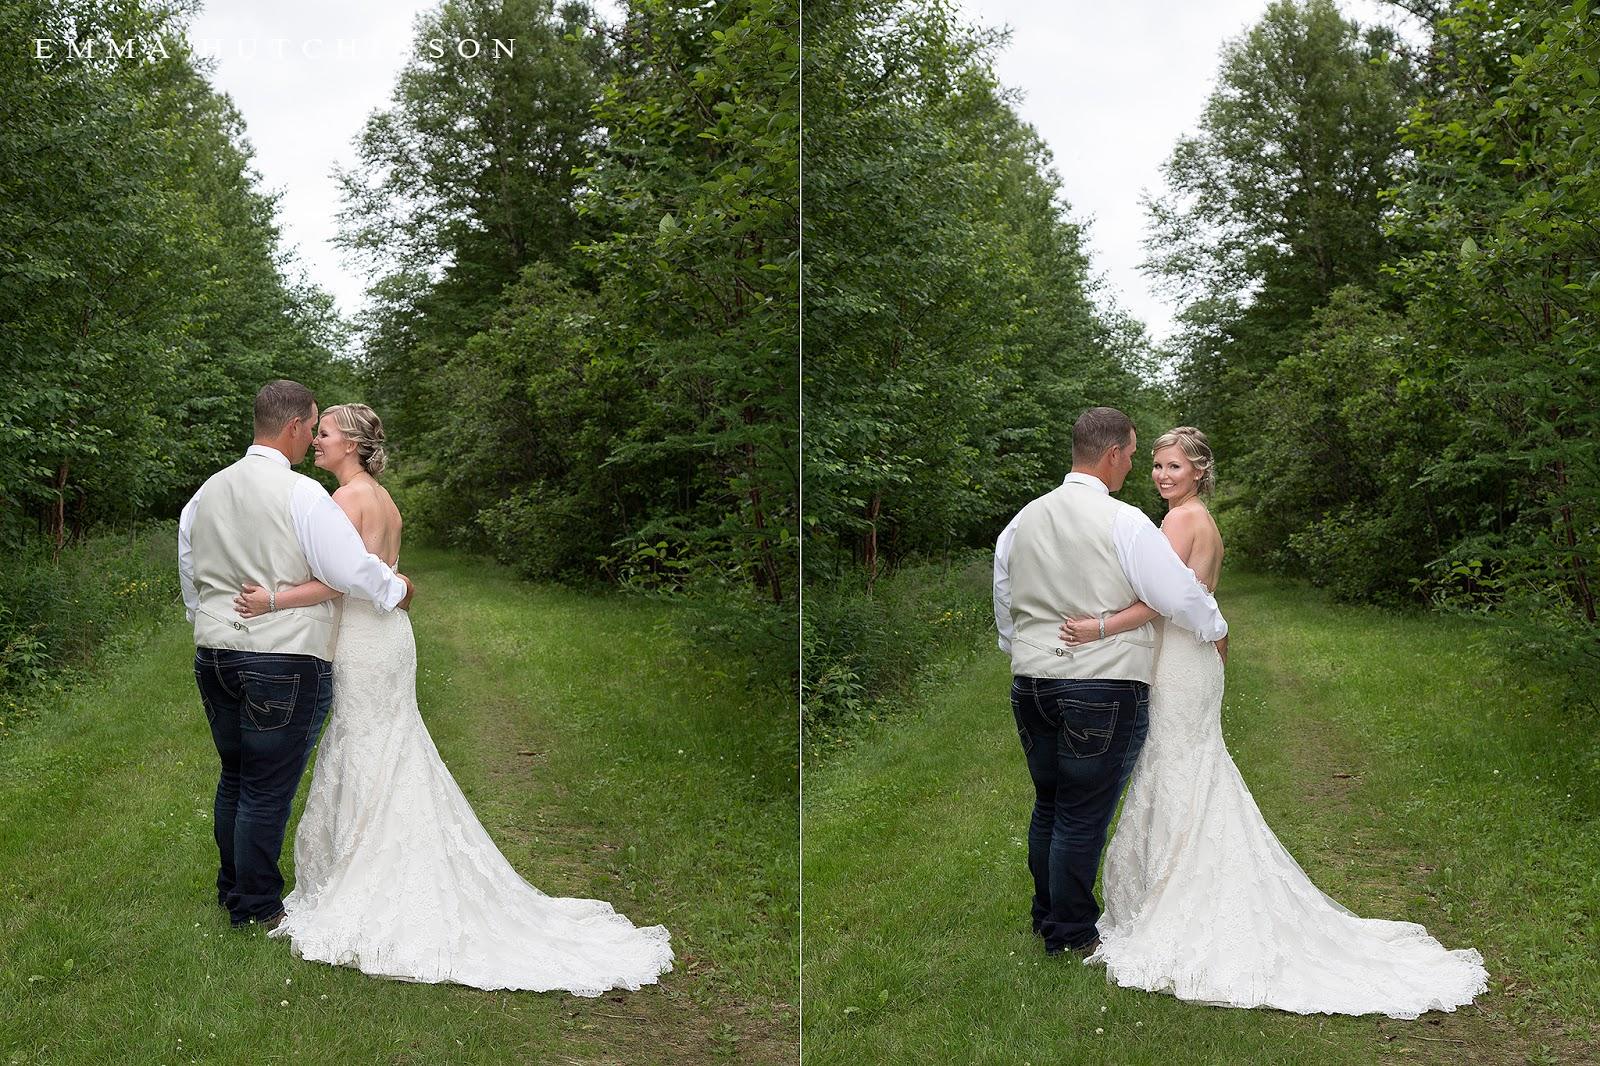 Newfoundland backyard wedding - Bride and Groom